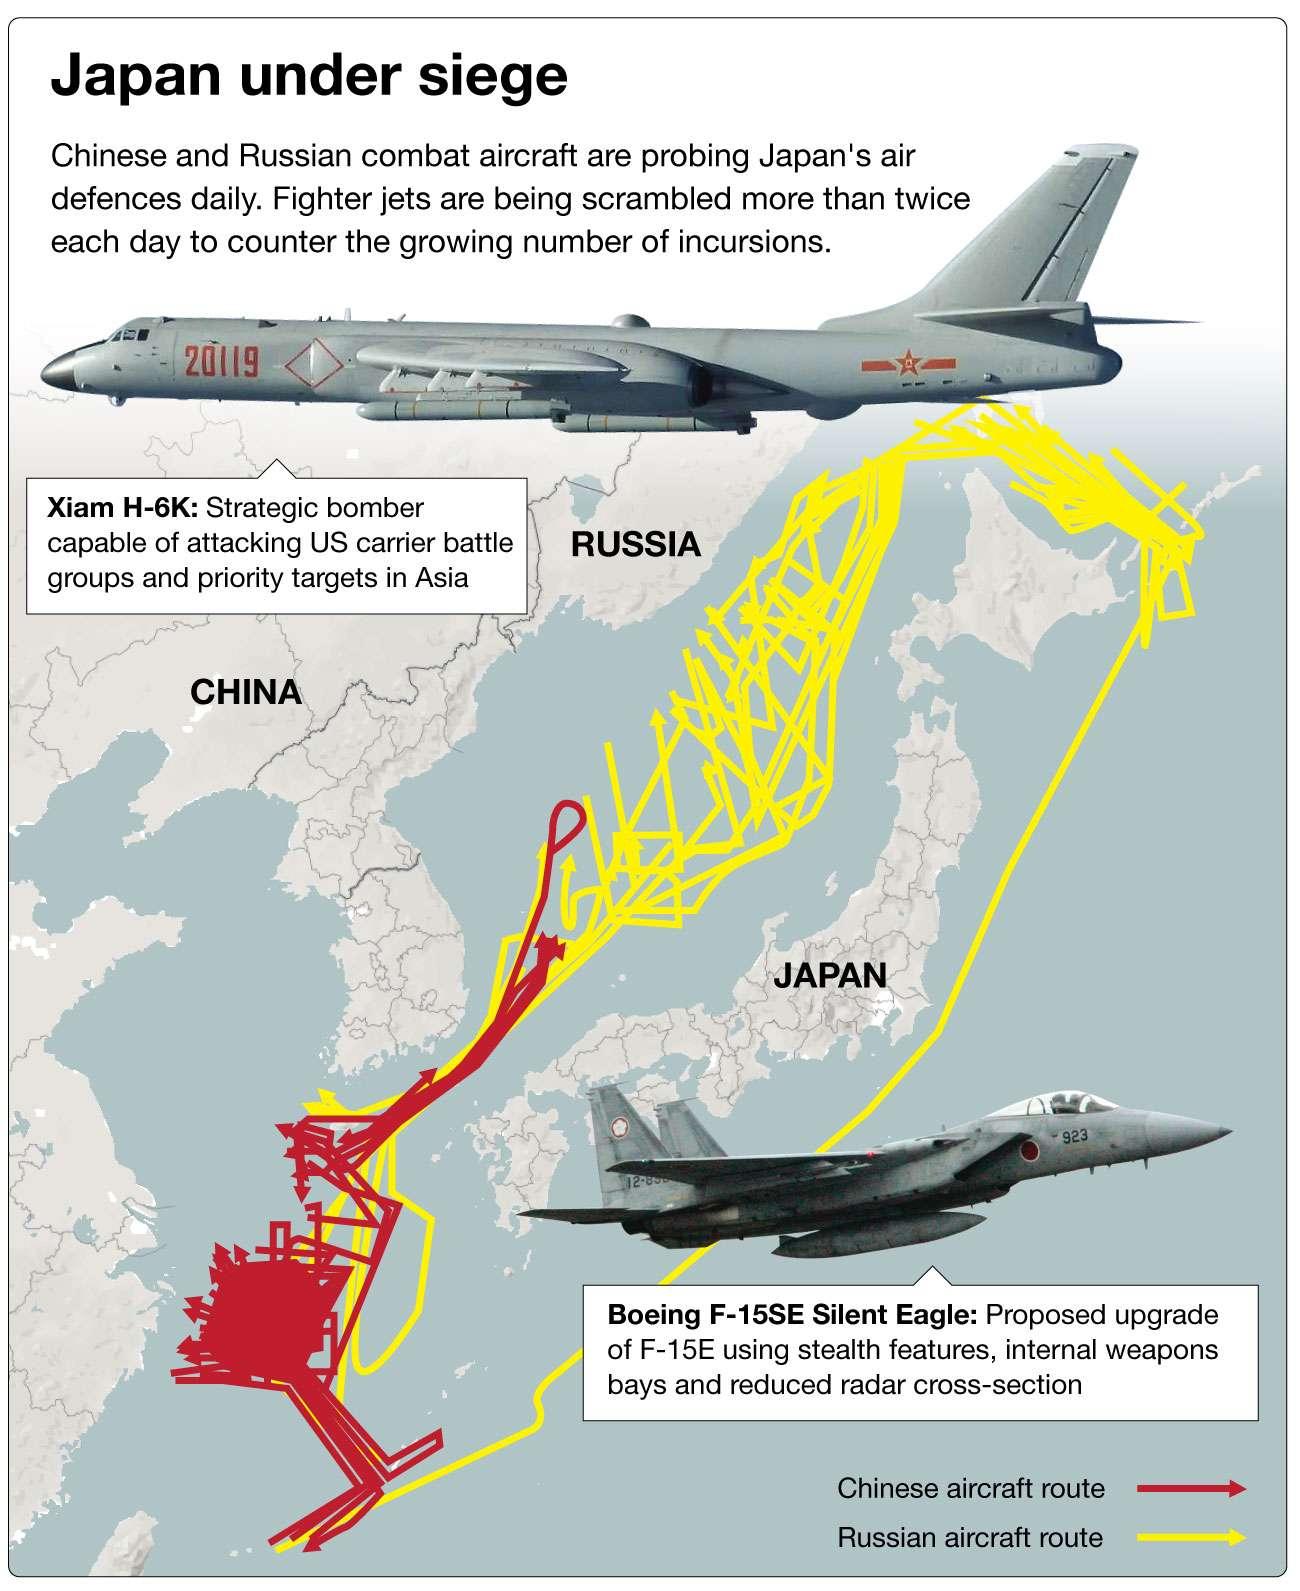 NED-2055-Japan under siege - 0